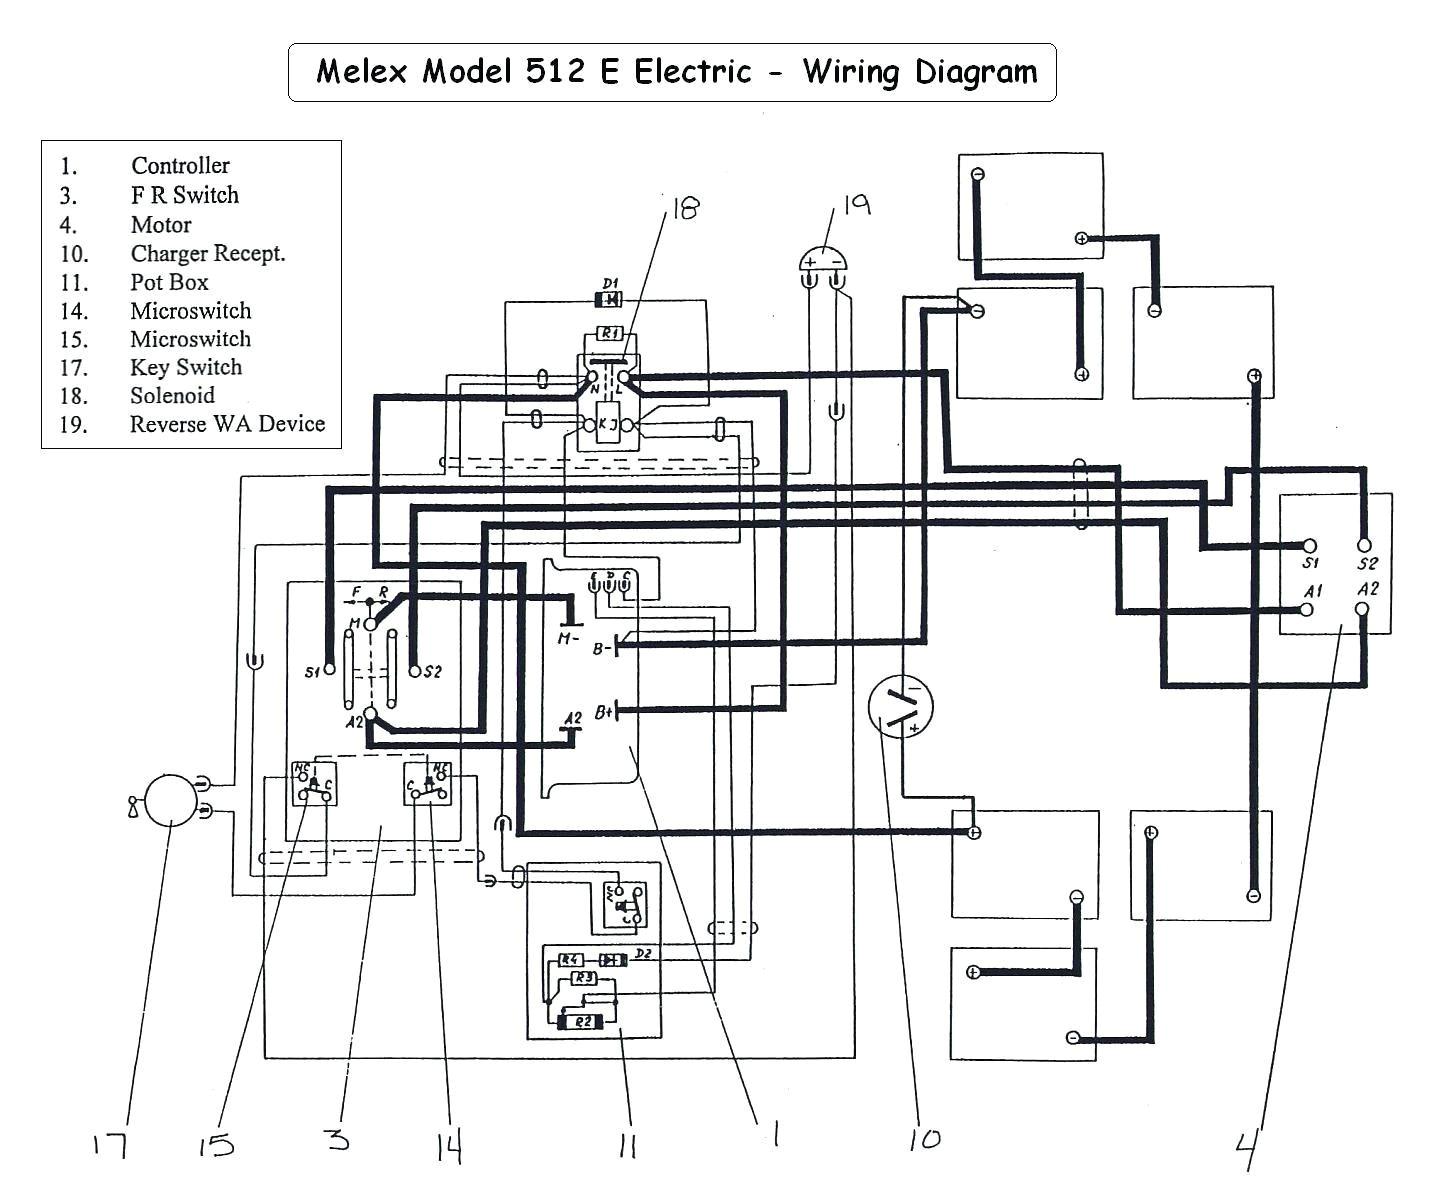 1976 ezgo golf cart gas engine wiring diagram wiring diagram guide